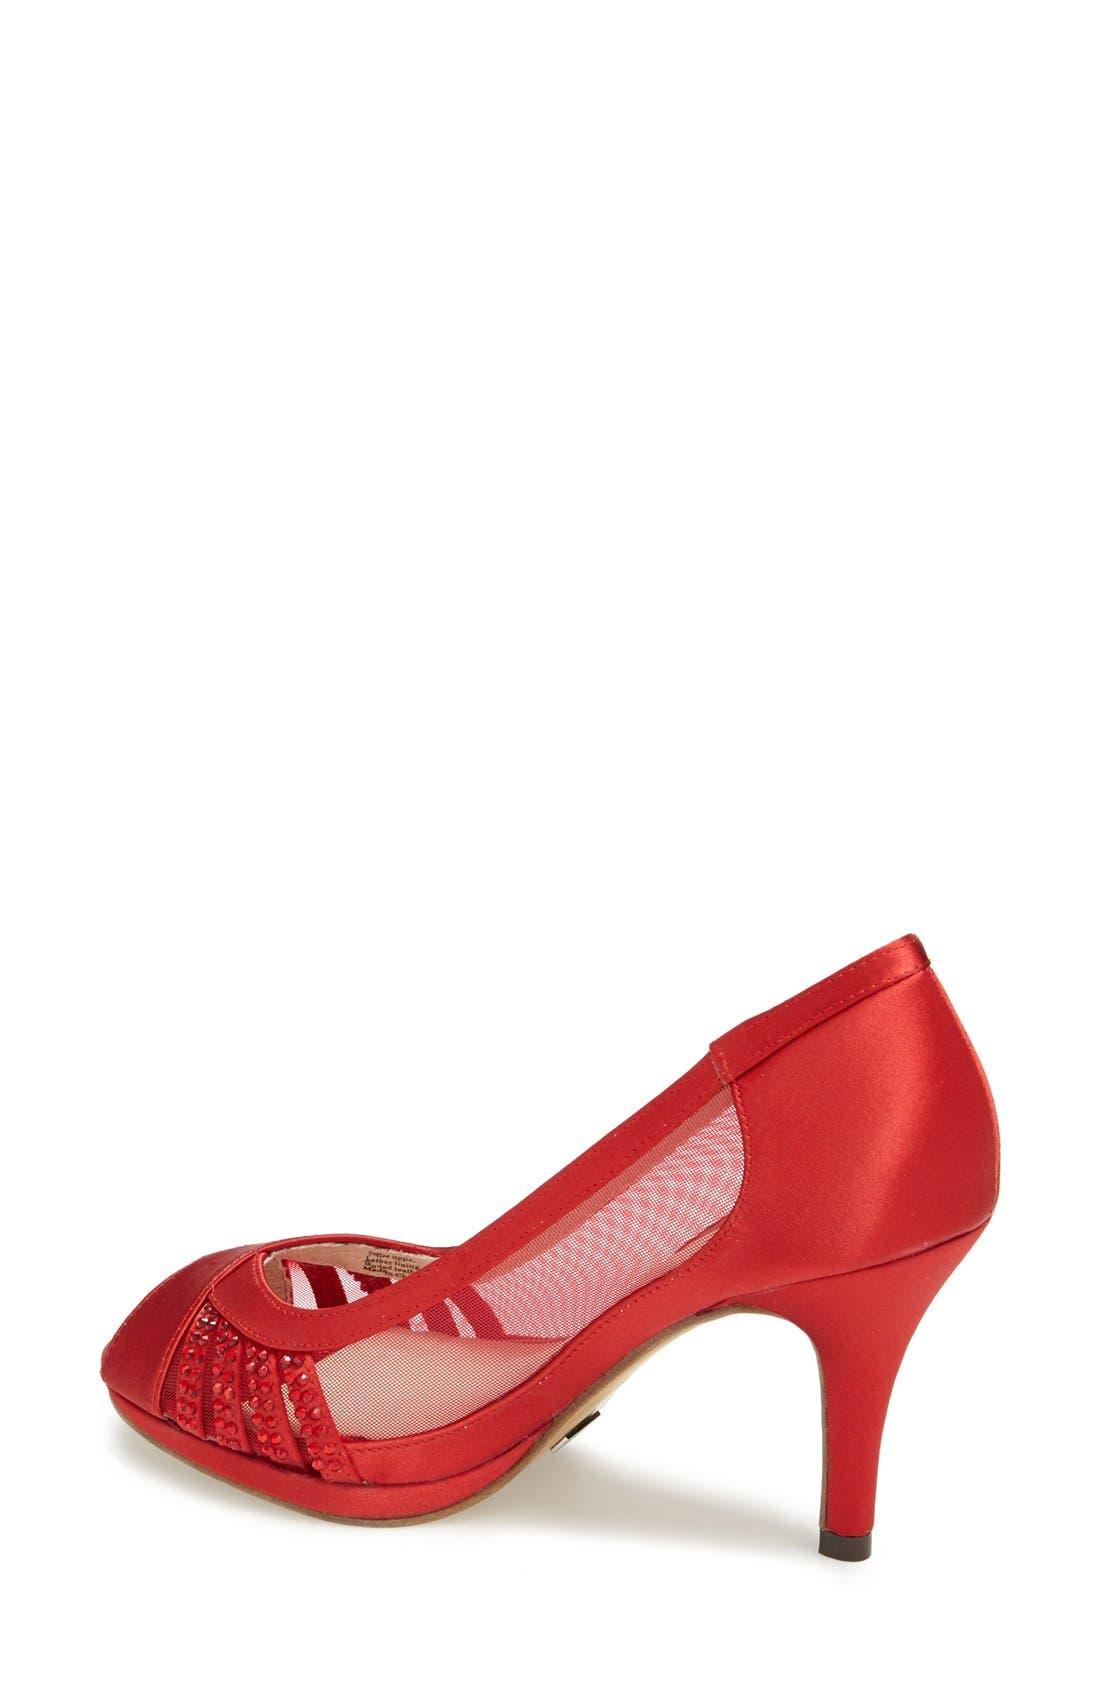 Alternate Image 2  - Menbur 'Balcones' Peep Toe Pump (Women)